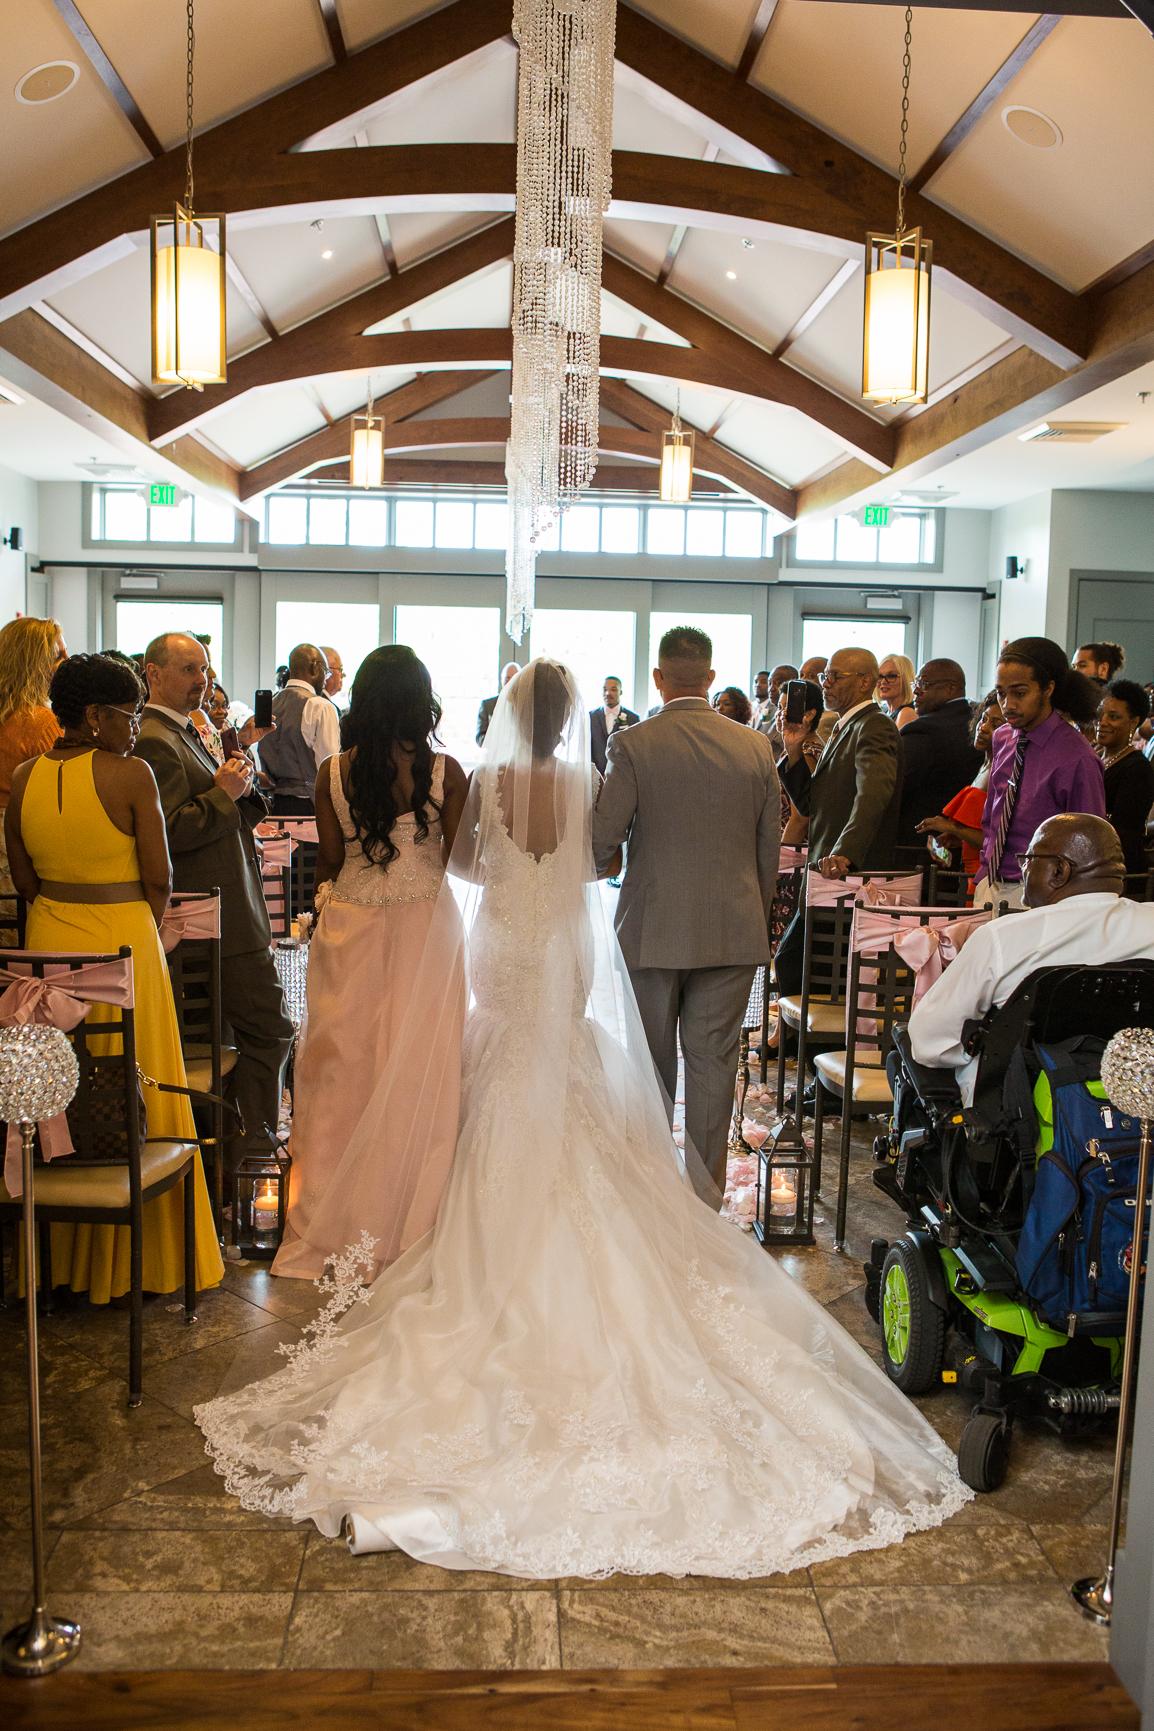 Noah's Morrisville  wedding venue photographer - 101 studio llc -13.jpg